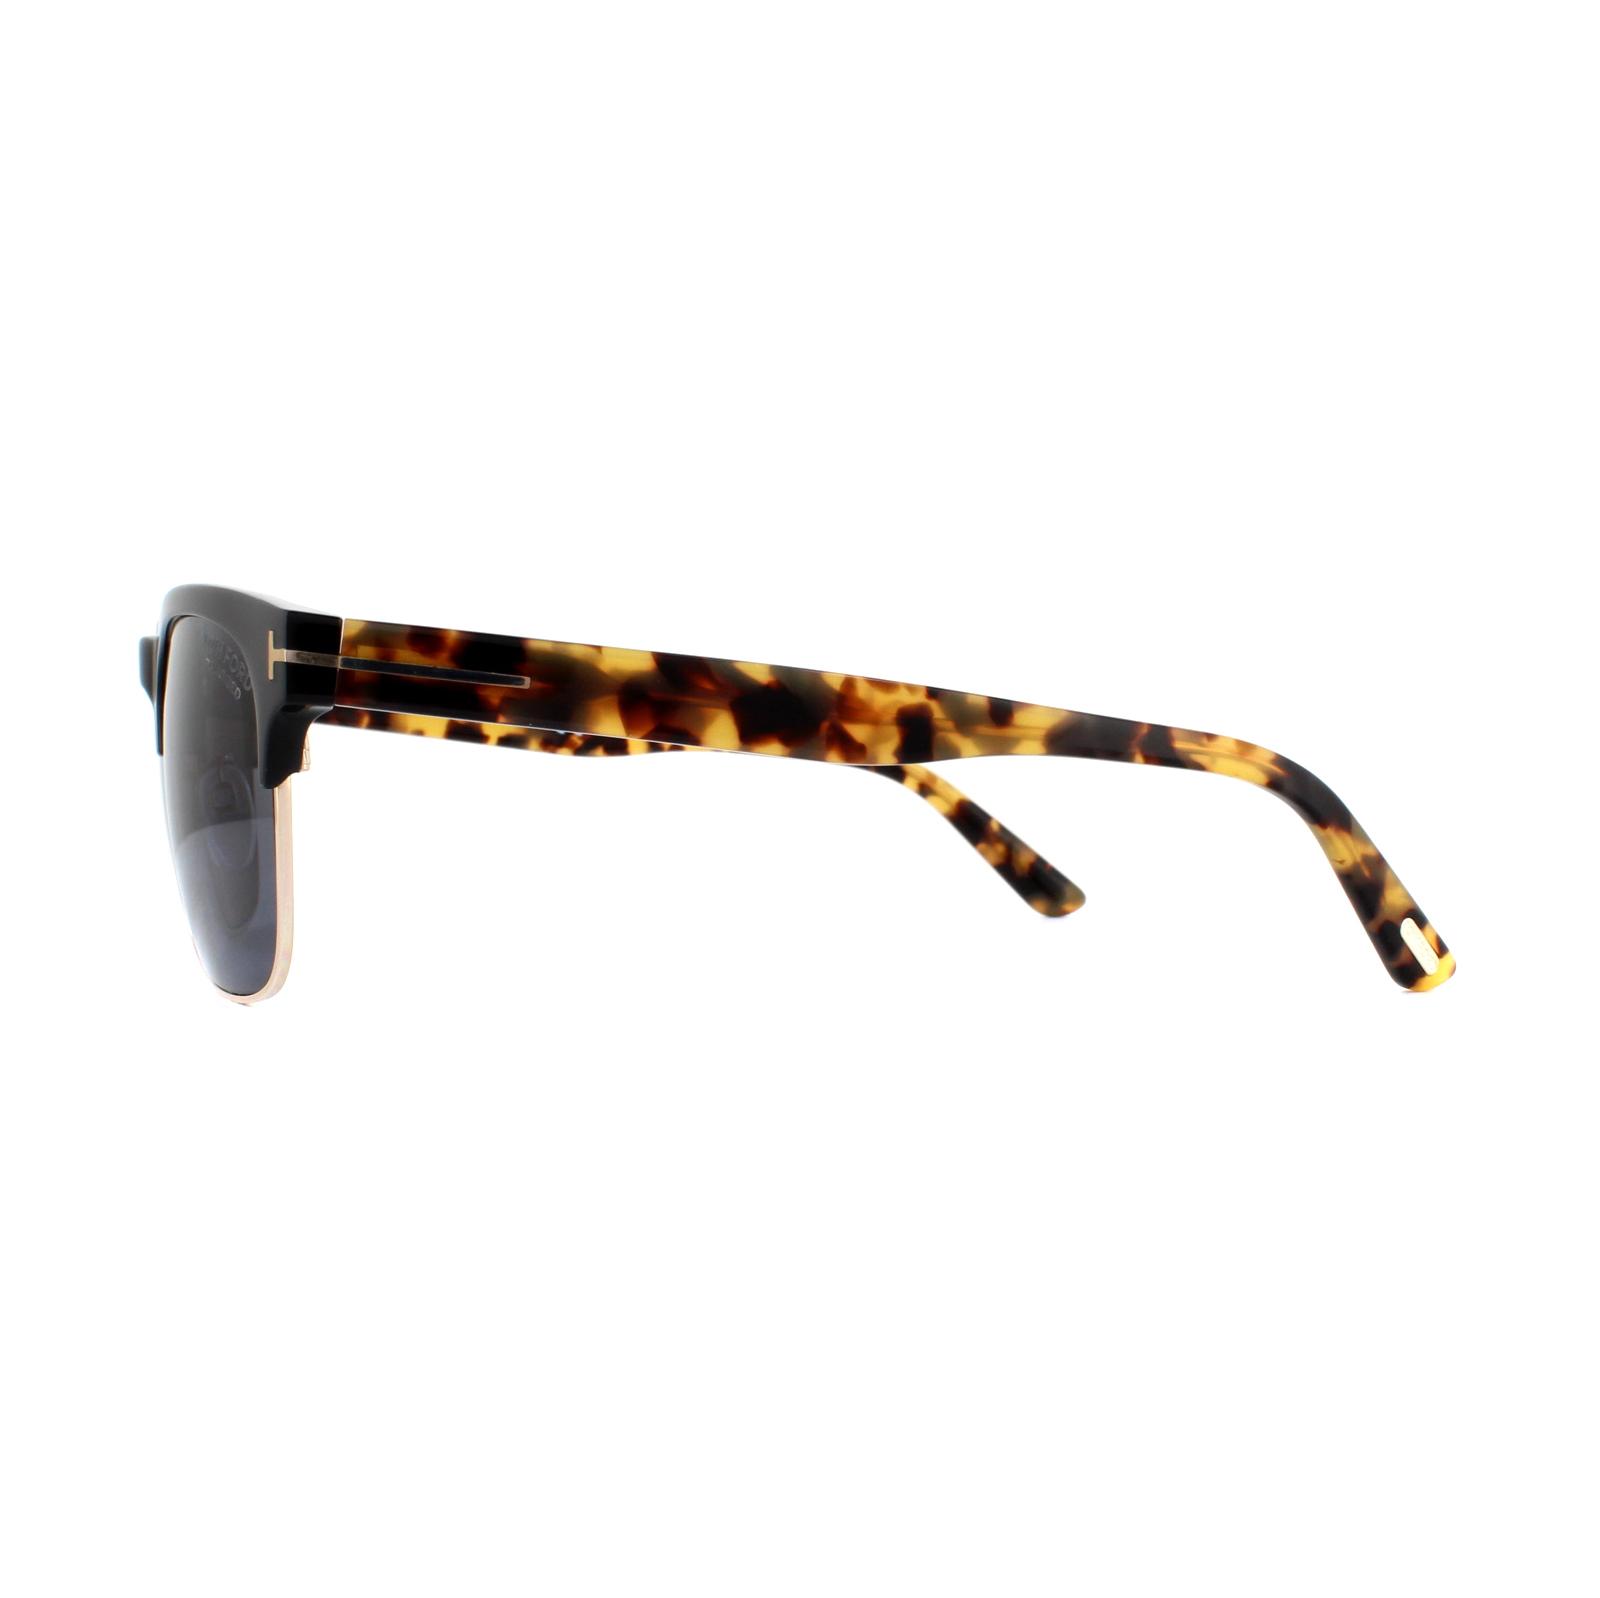 522eca2b3f7 Sentinel Tom Ford Sunglasses Louis FT0386 01D Black   Havana Grey Polarized